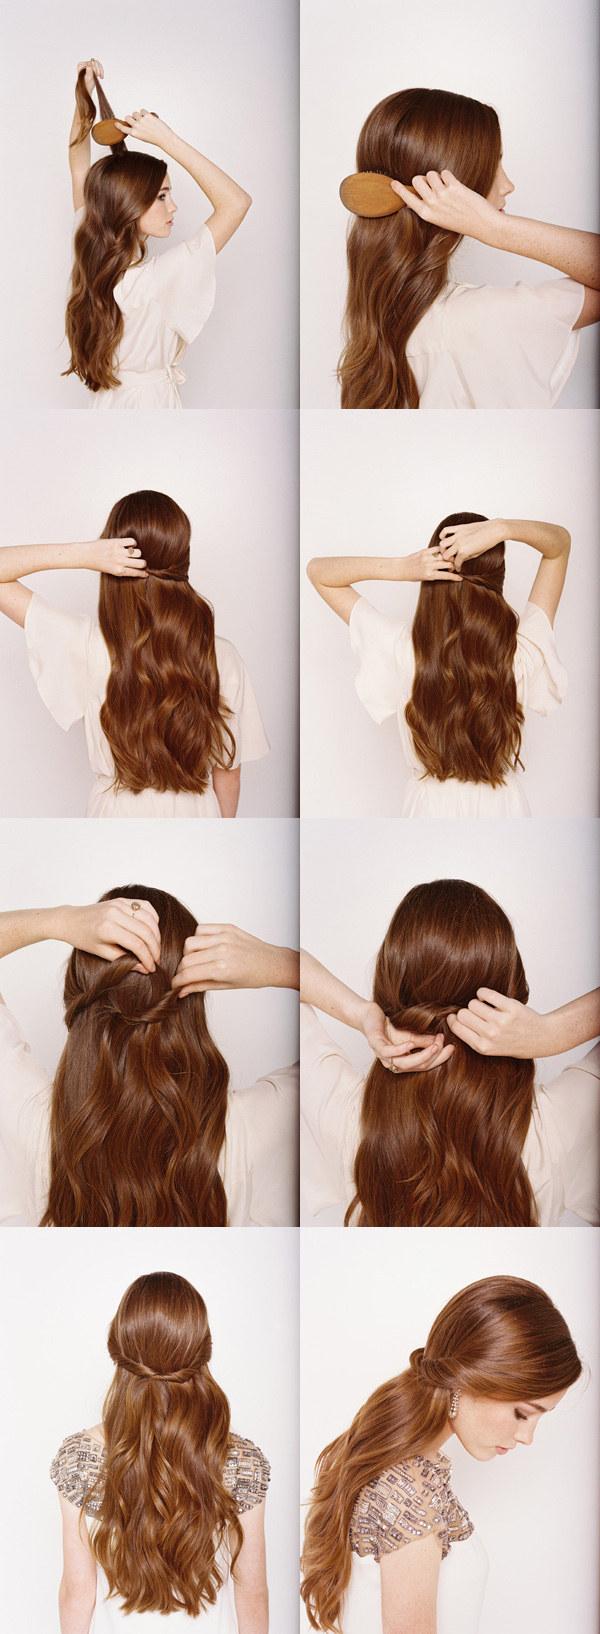 Sleek-Half-up-Half-down Hair Tutorials to Style Your Hair